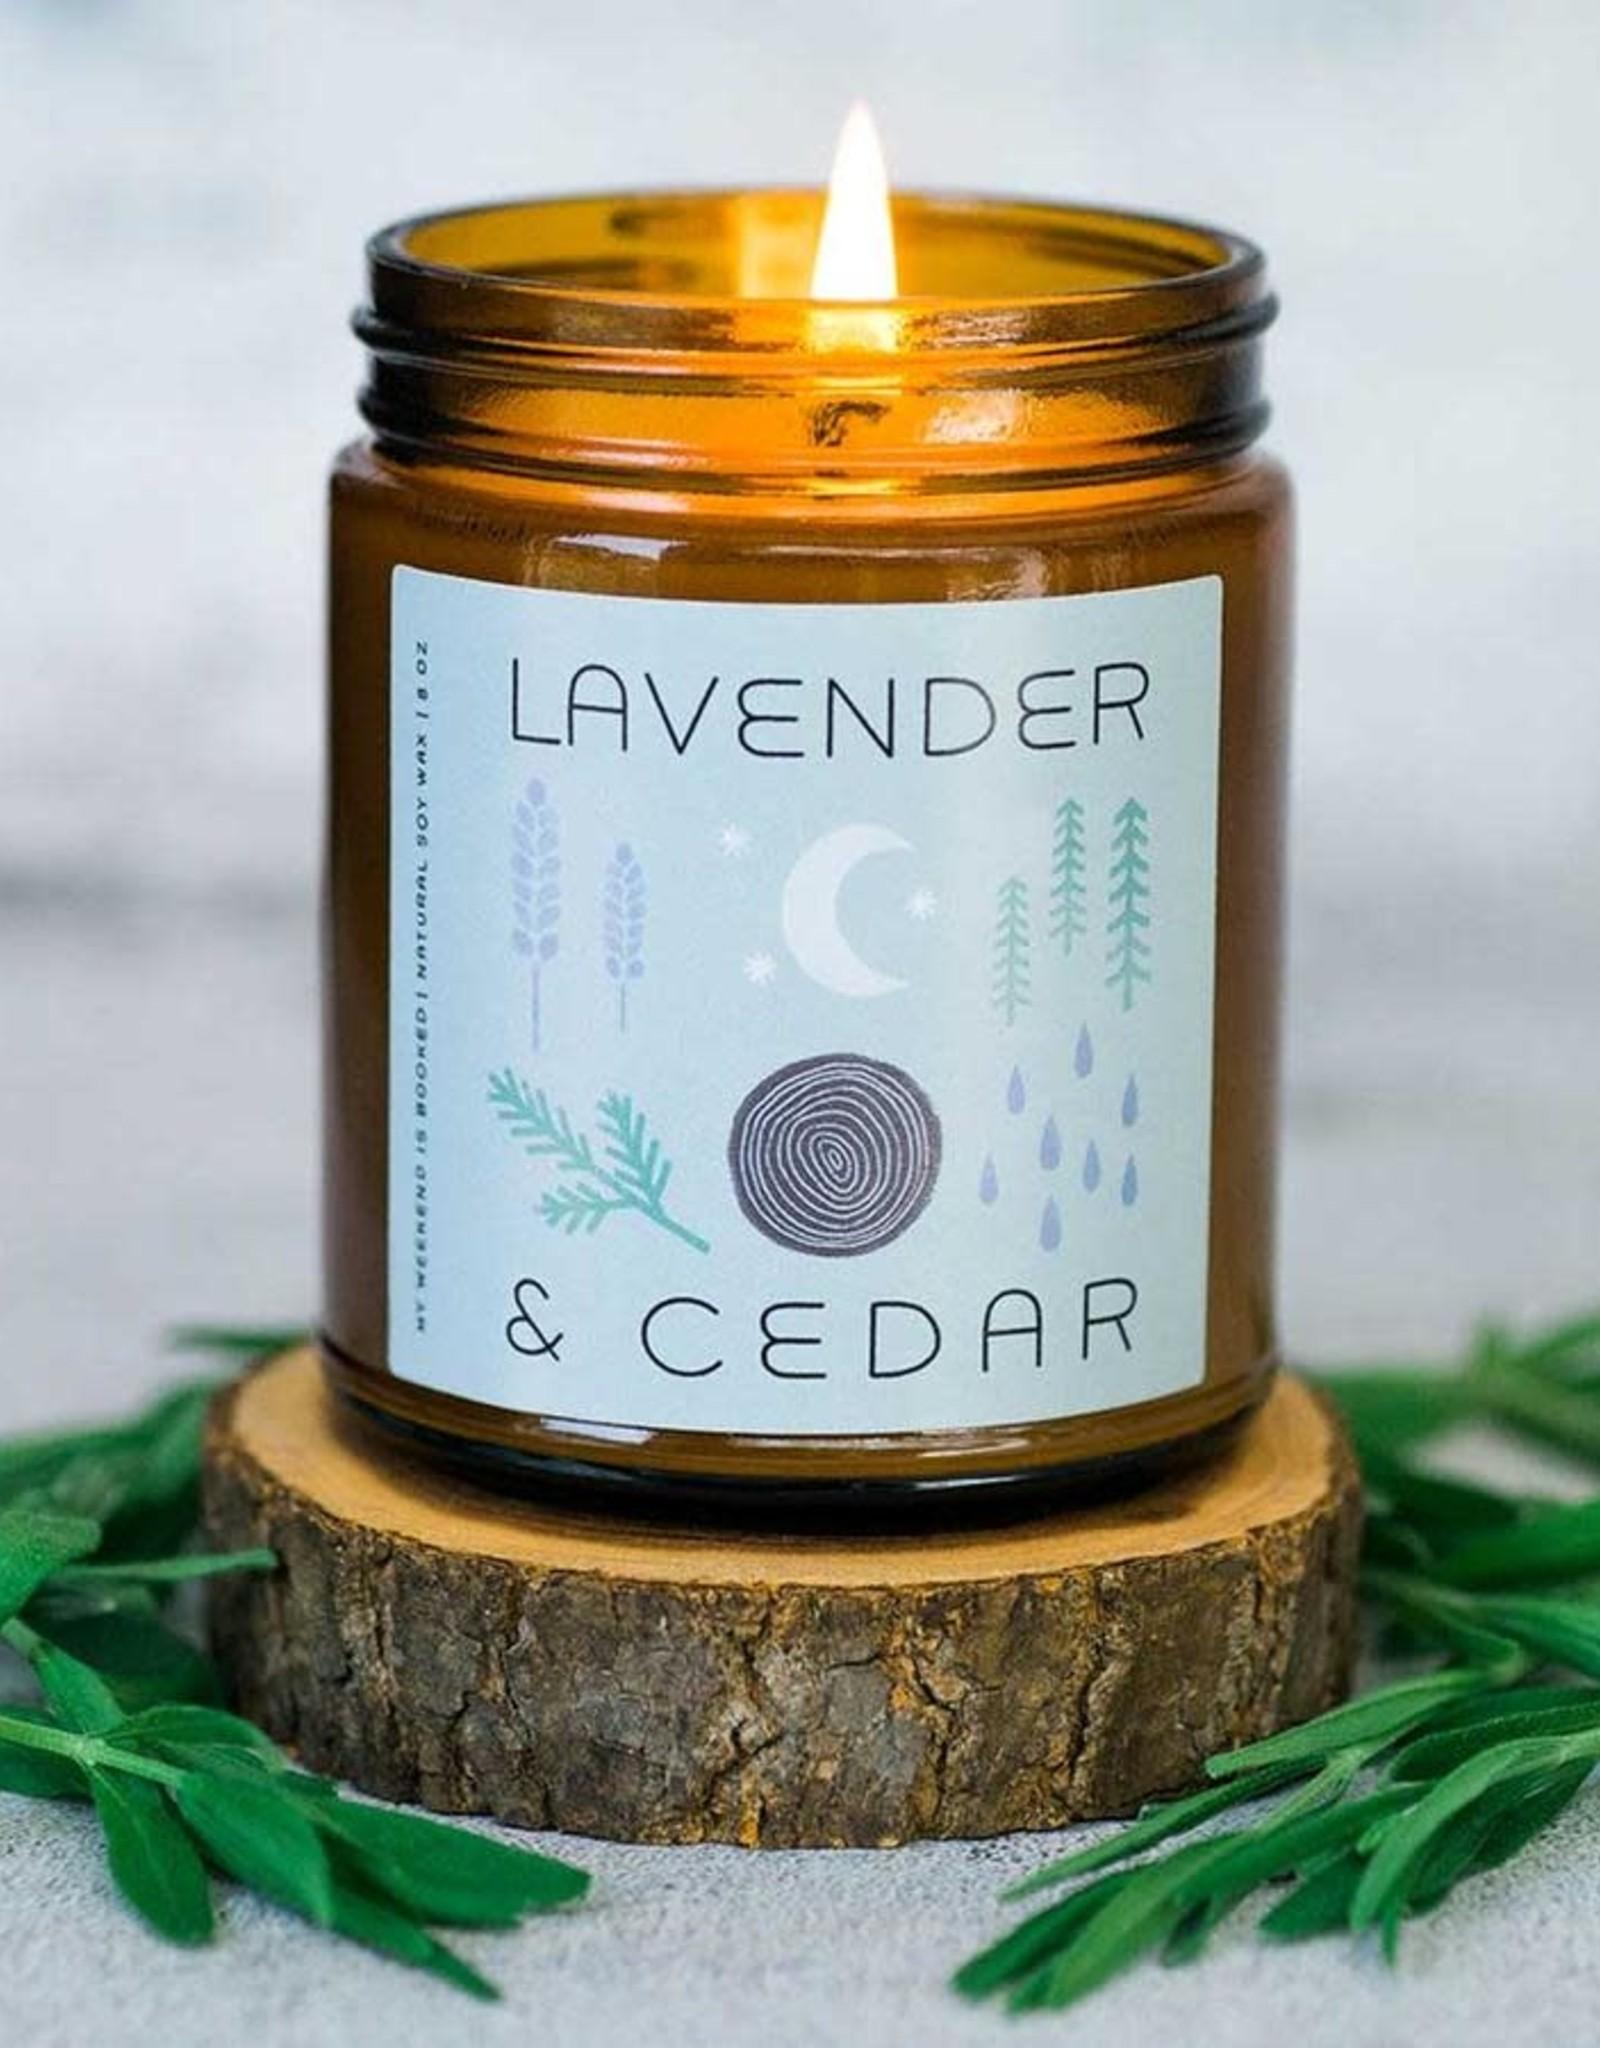 My Weekend Is Booked My Weekend Is Booked Candle - Lavender & Cedar